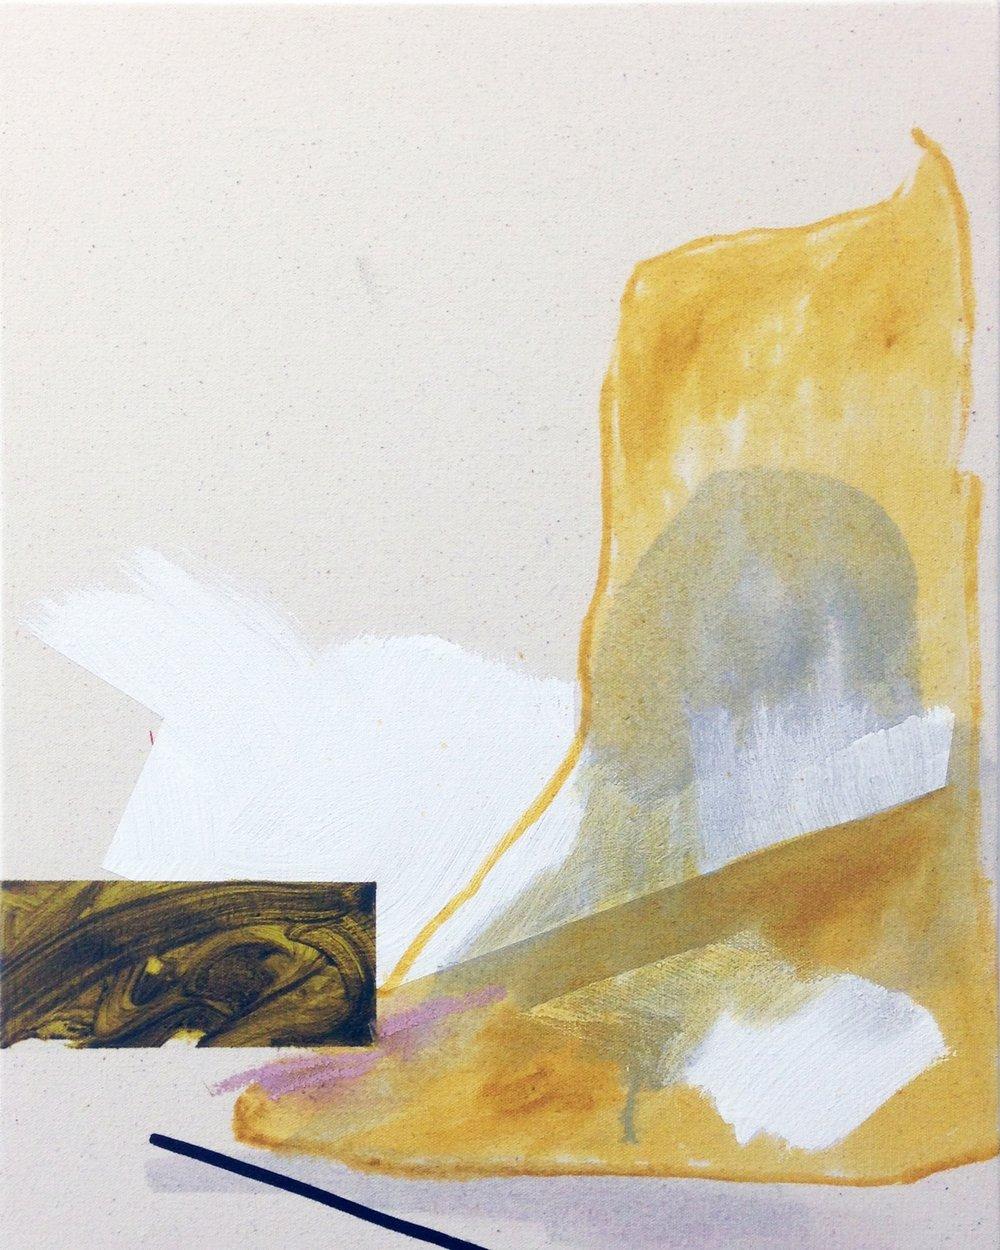 "Oil and acrylicon canvas 45.5cm x 35.5cm (18"" x 14"") 2017"